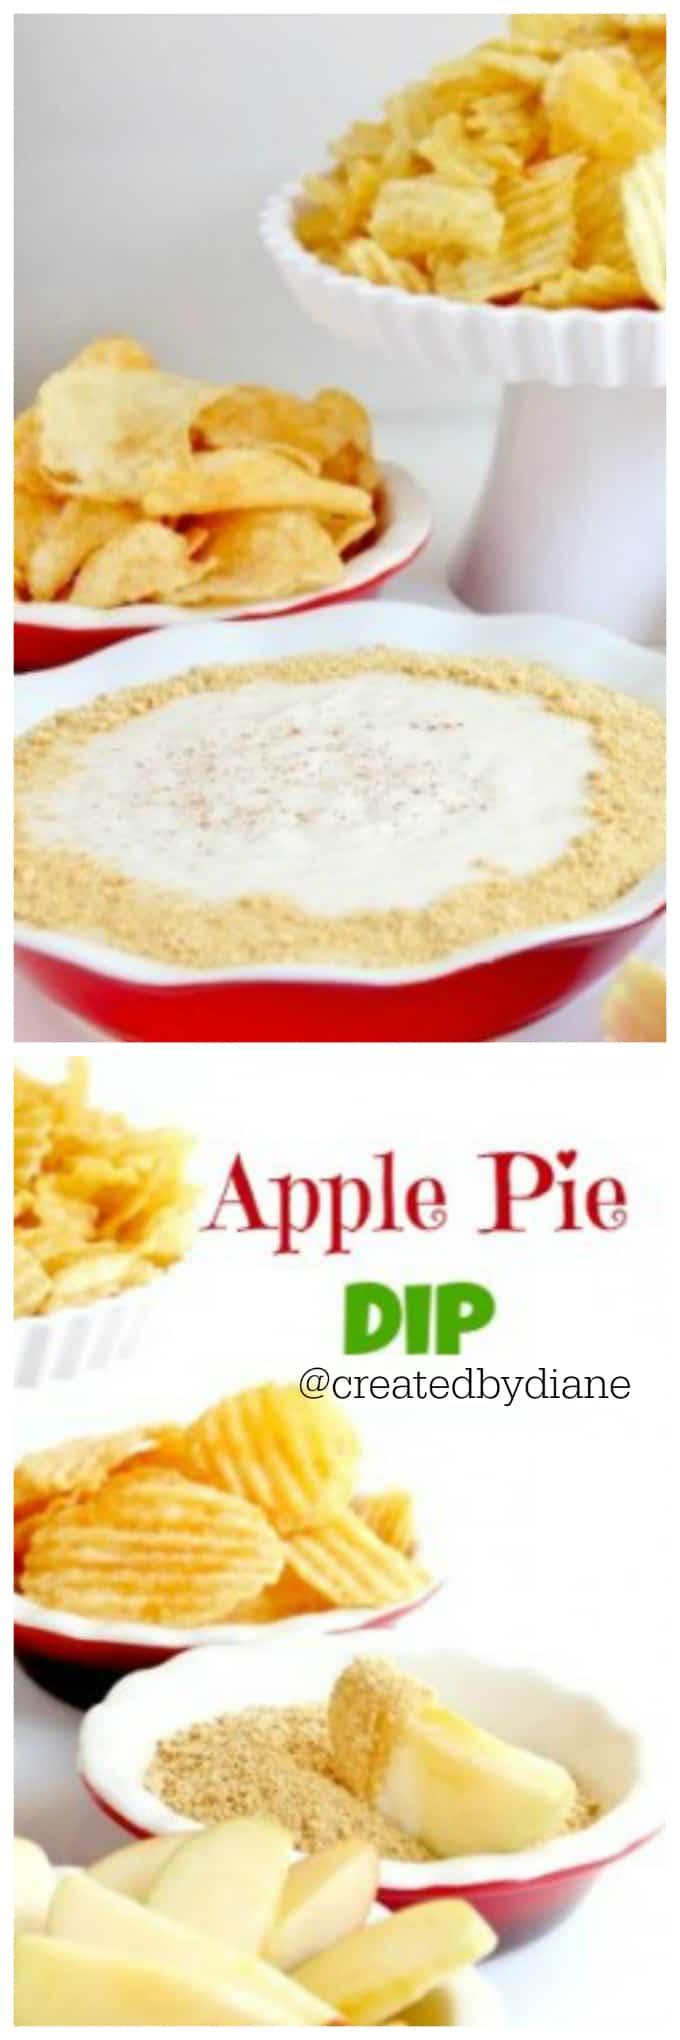 apple pie dip @createdbydiane